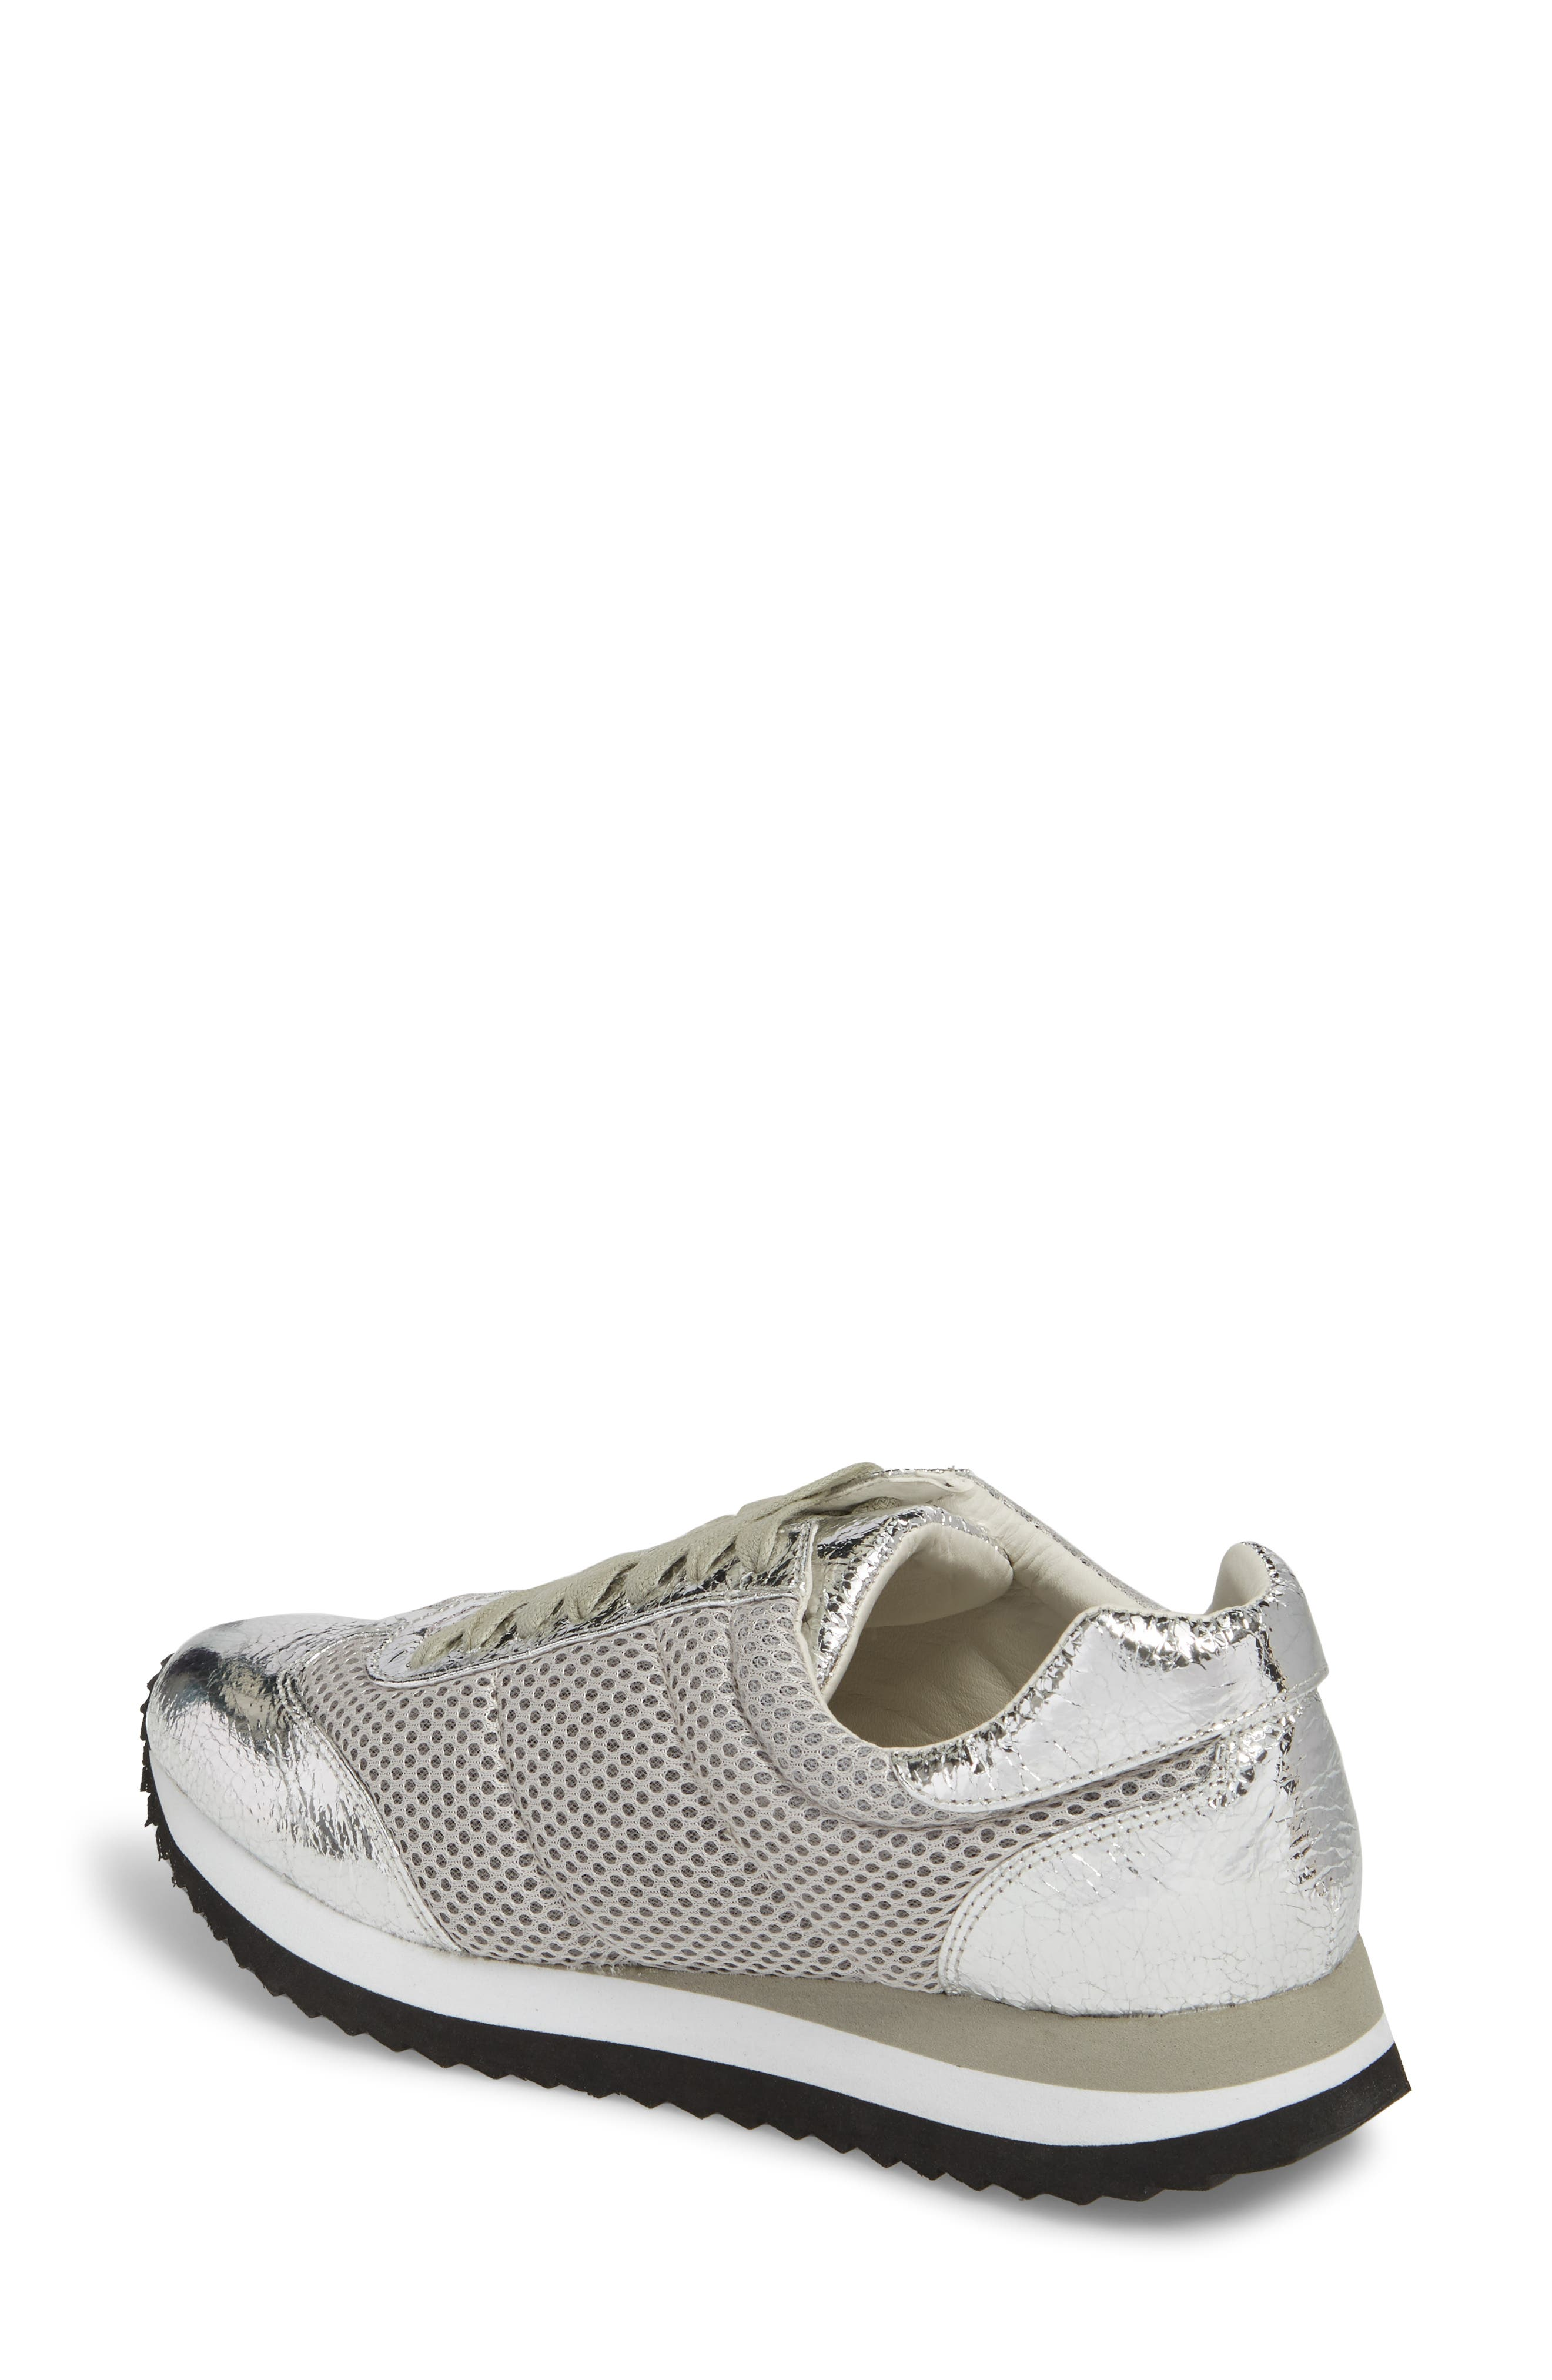 Jaclyn Mesh Sneaker,                             Alternate thumbnail 2, color,                             Silver